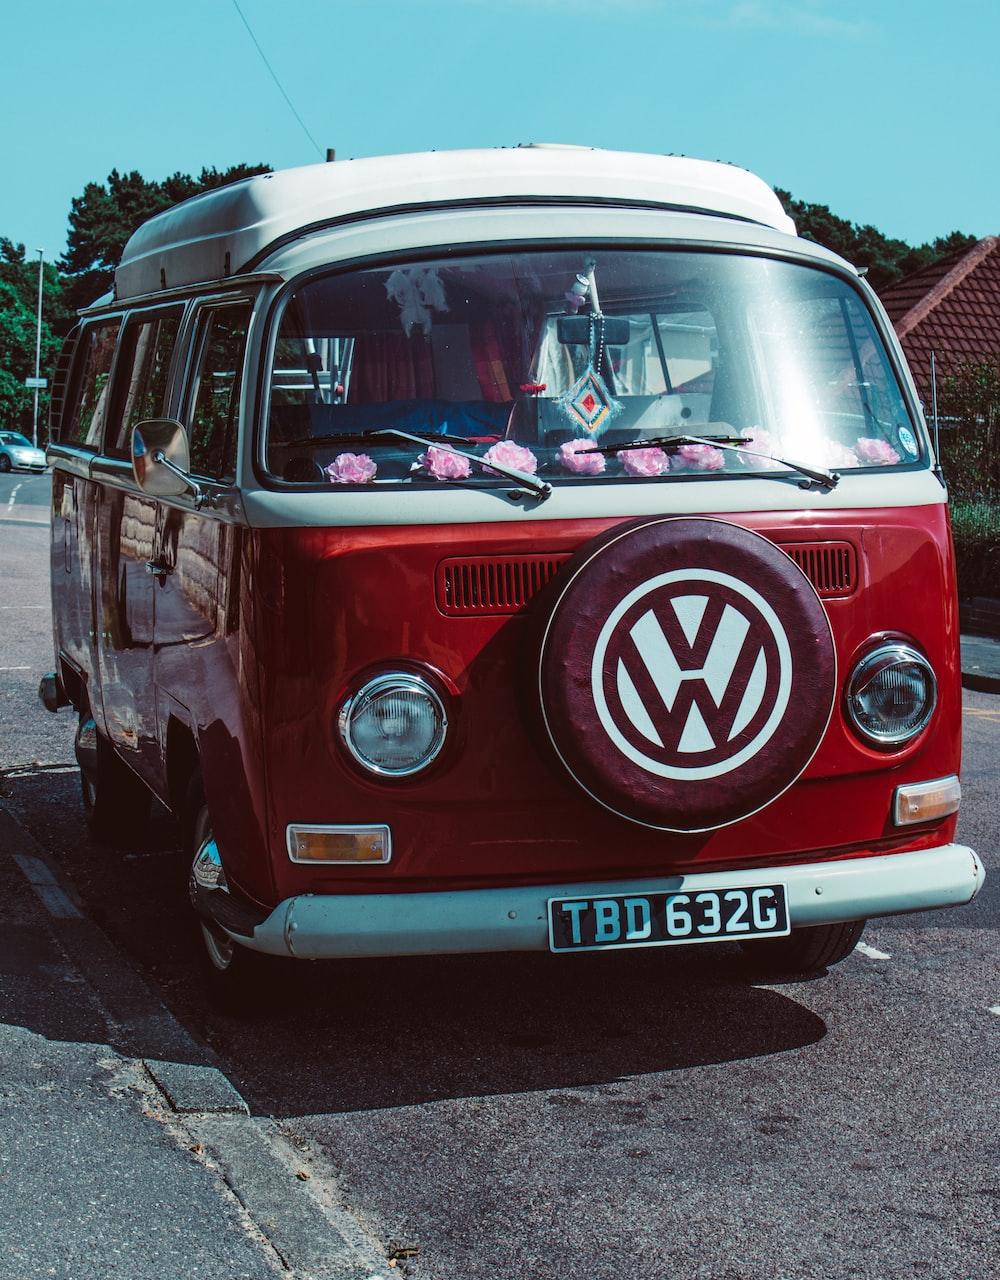 red Volkswagen T2 van parked near house